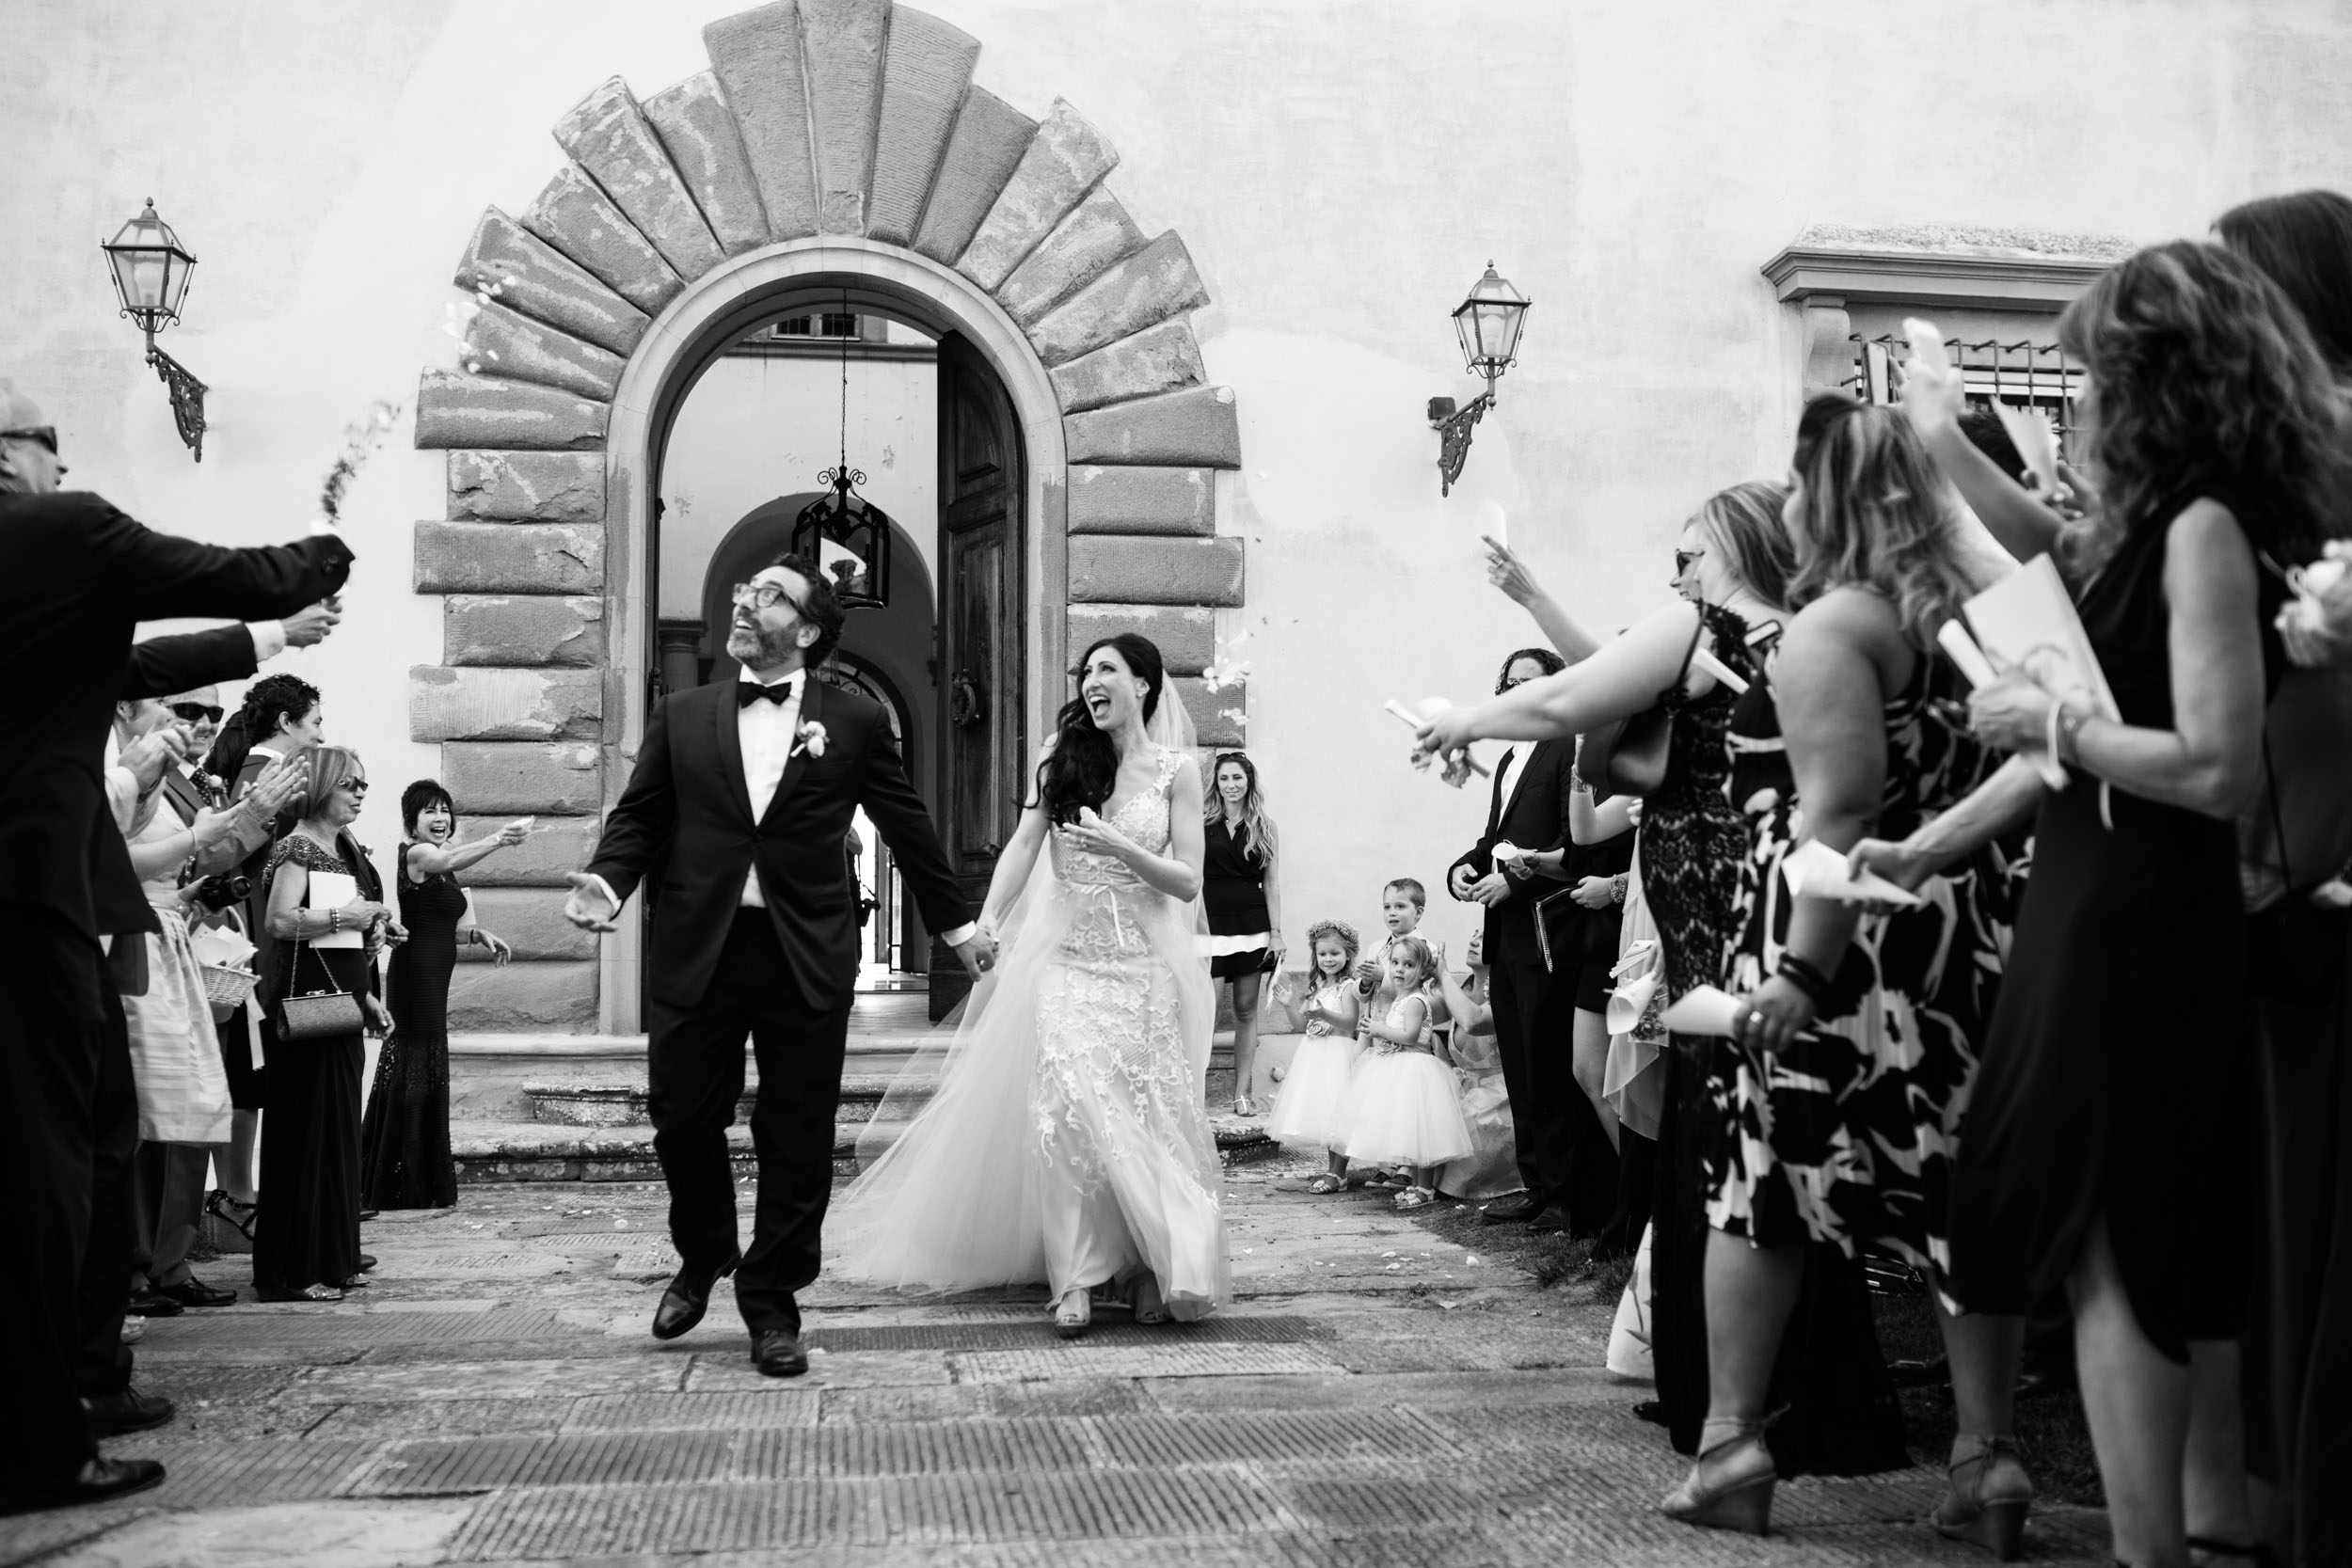 villa-gamberaia-florence-italy-destination-wedding-51.jpg